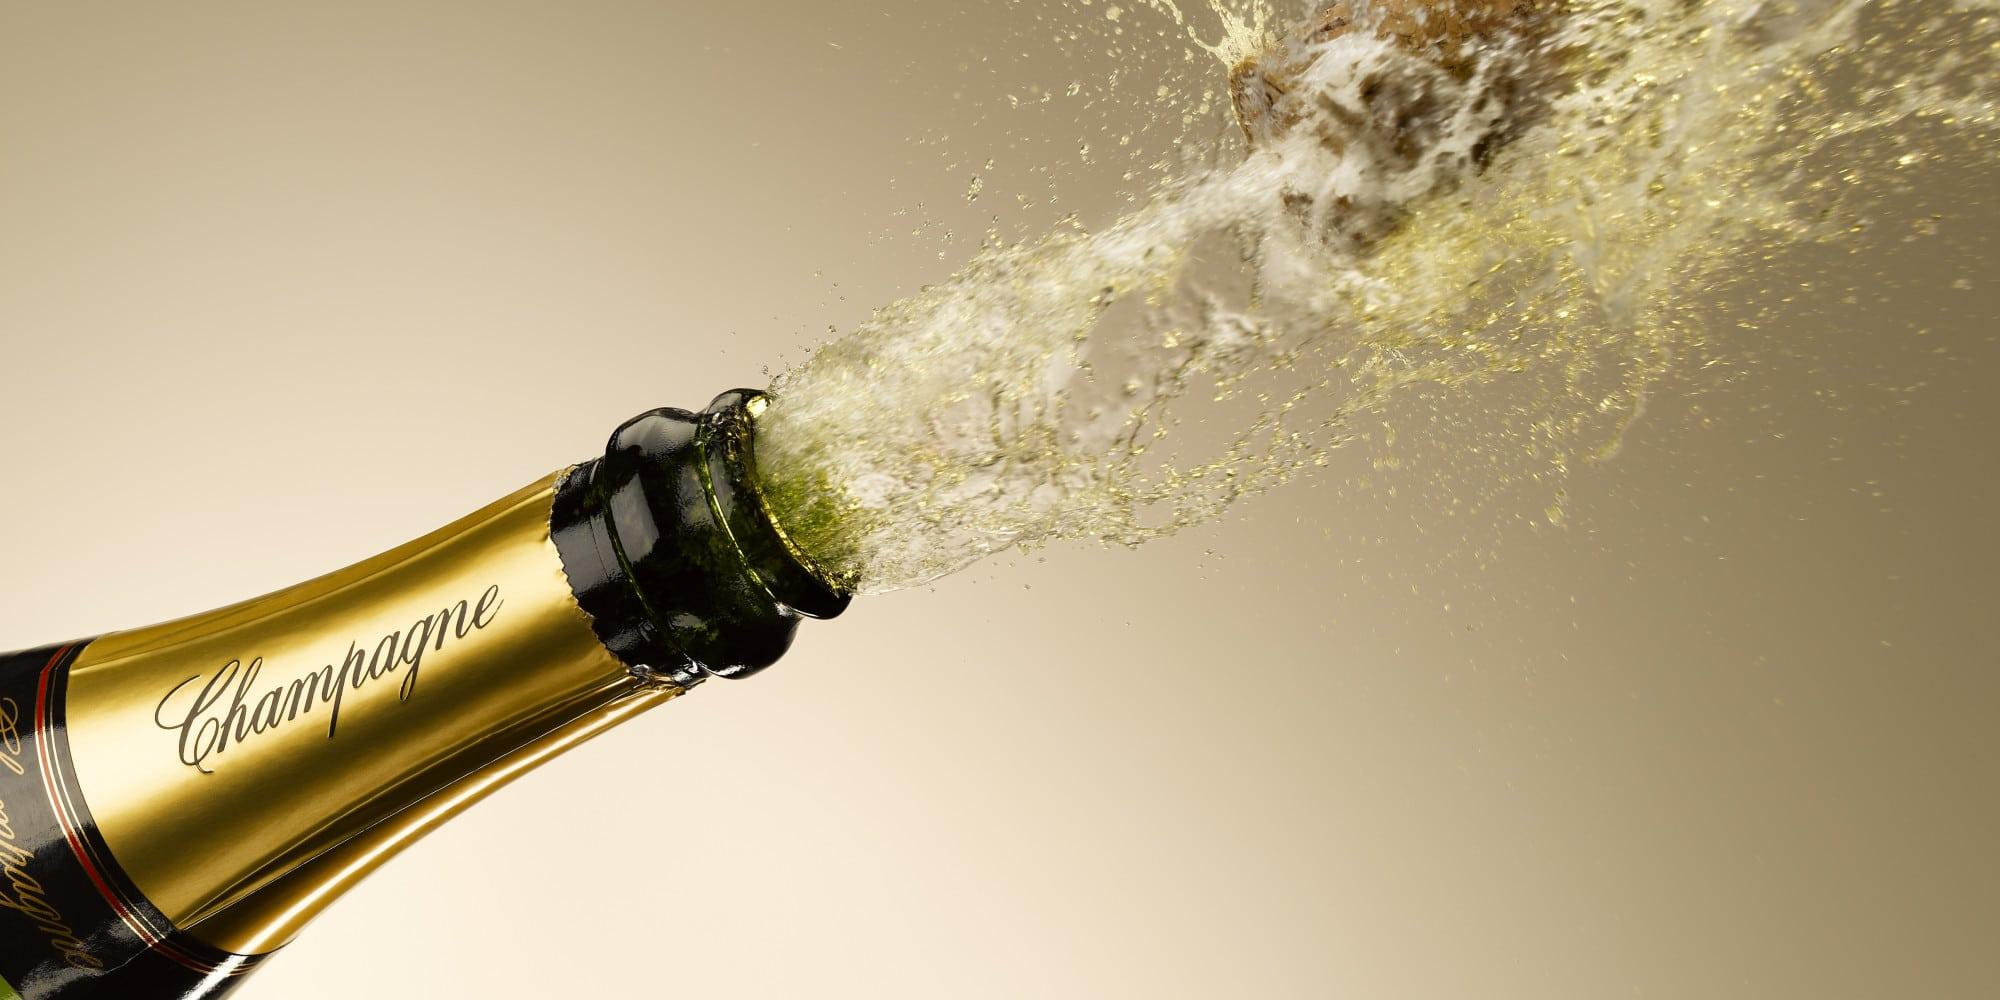 Champagne - O Photo